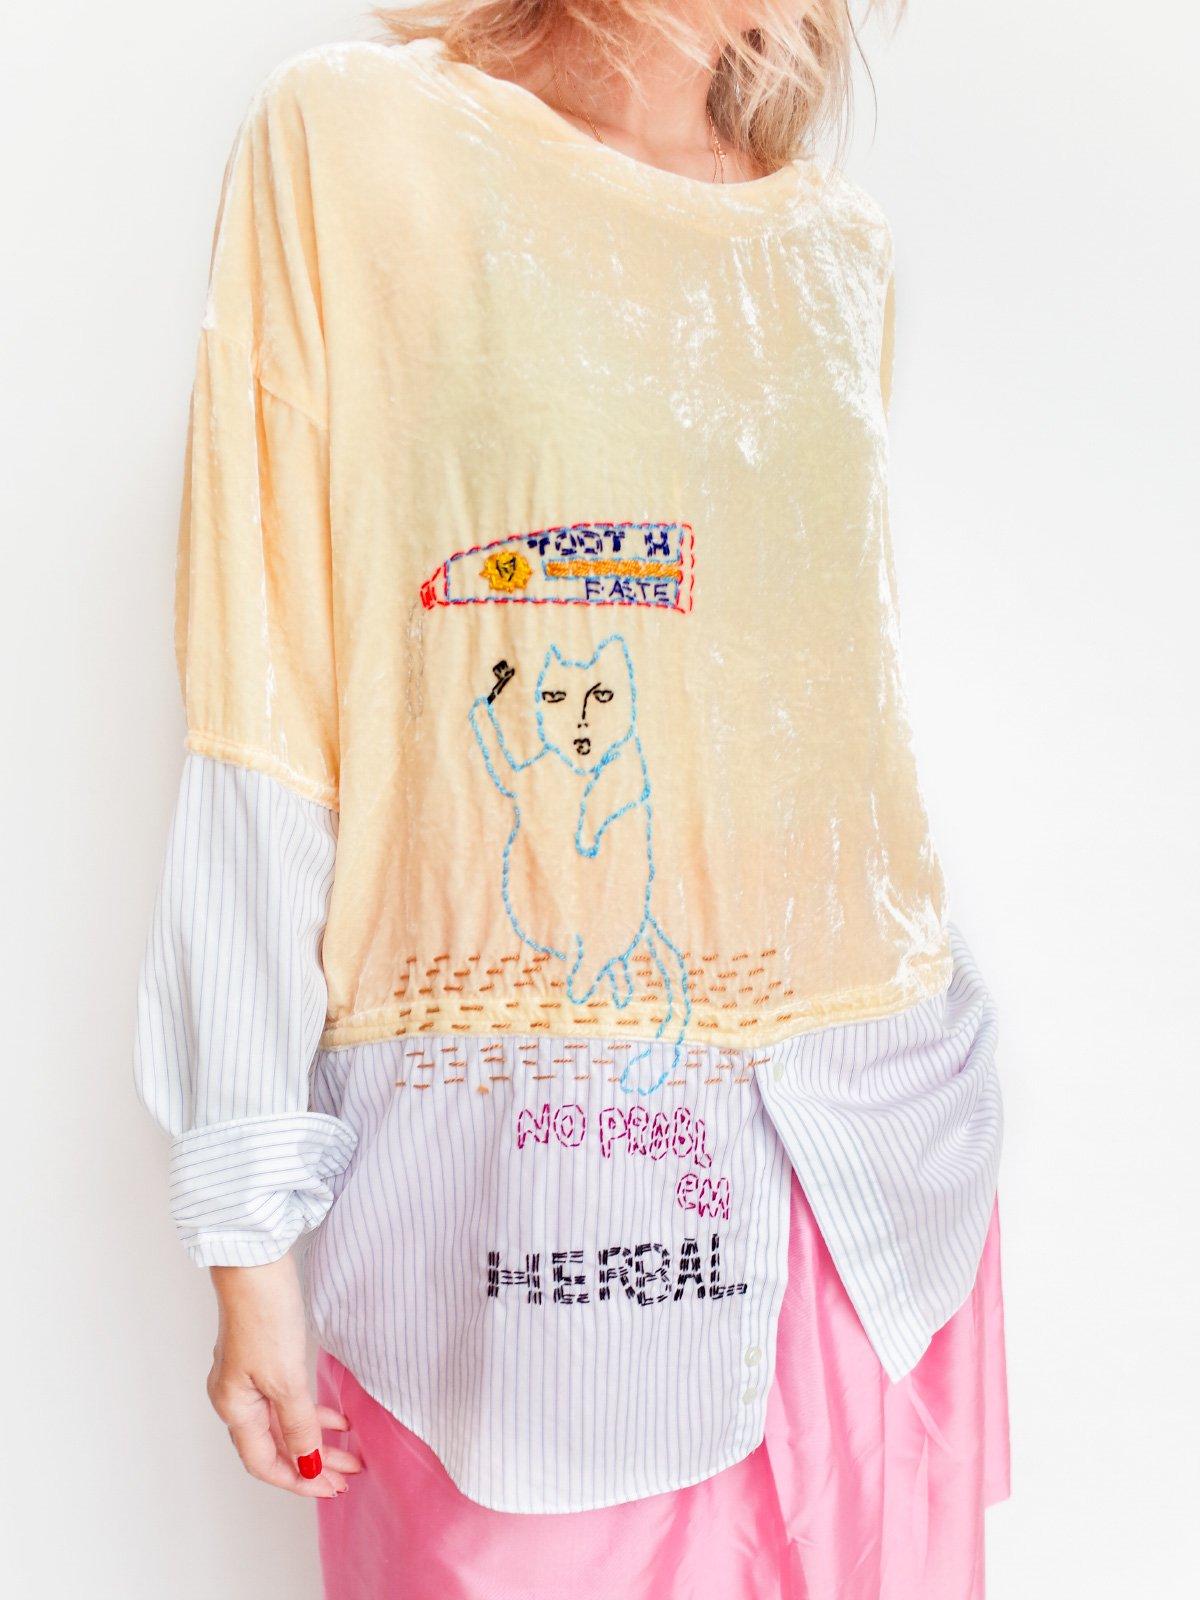 ari × mamarobot / Remake Velvet T + Shirts